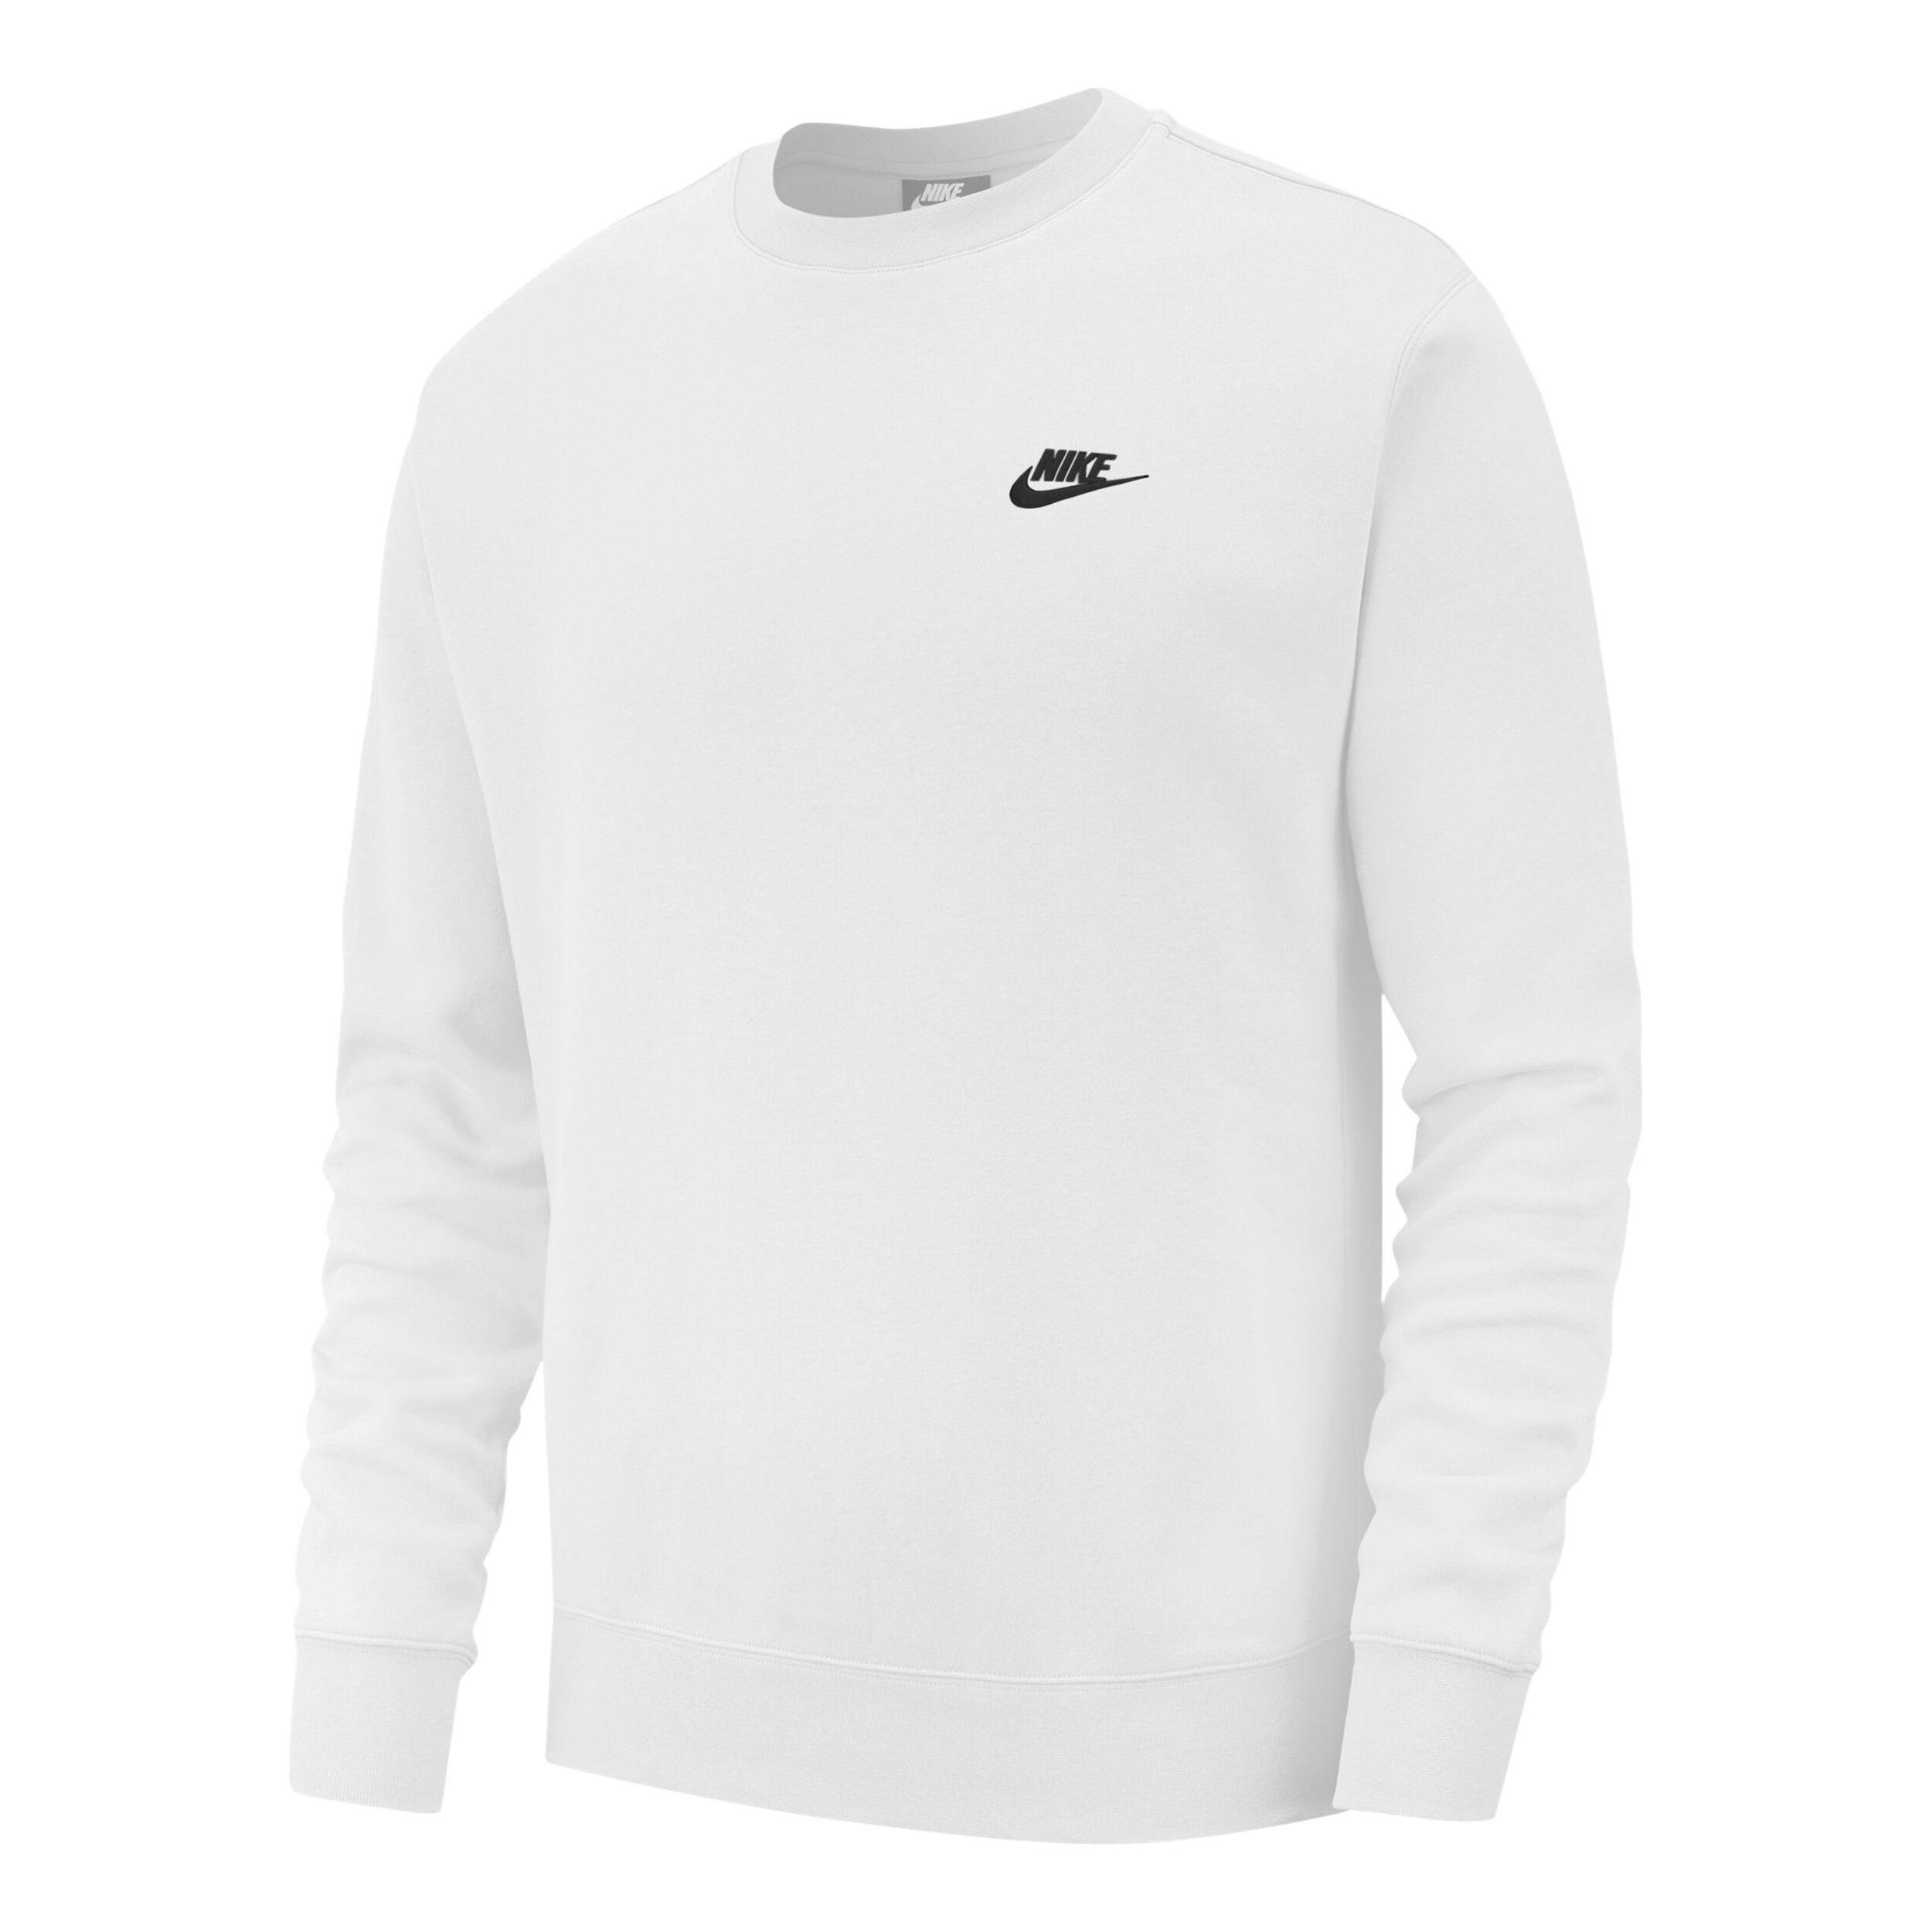 Nike Sportswear Club Crew Huvtröja Herrar Vit, Svart